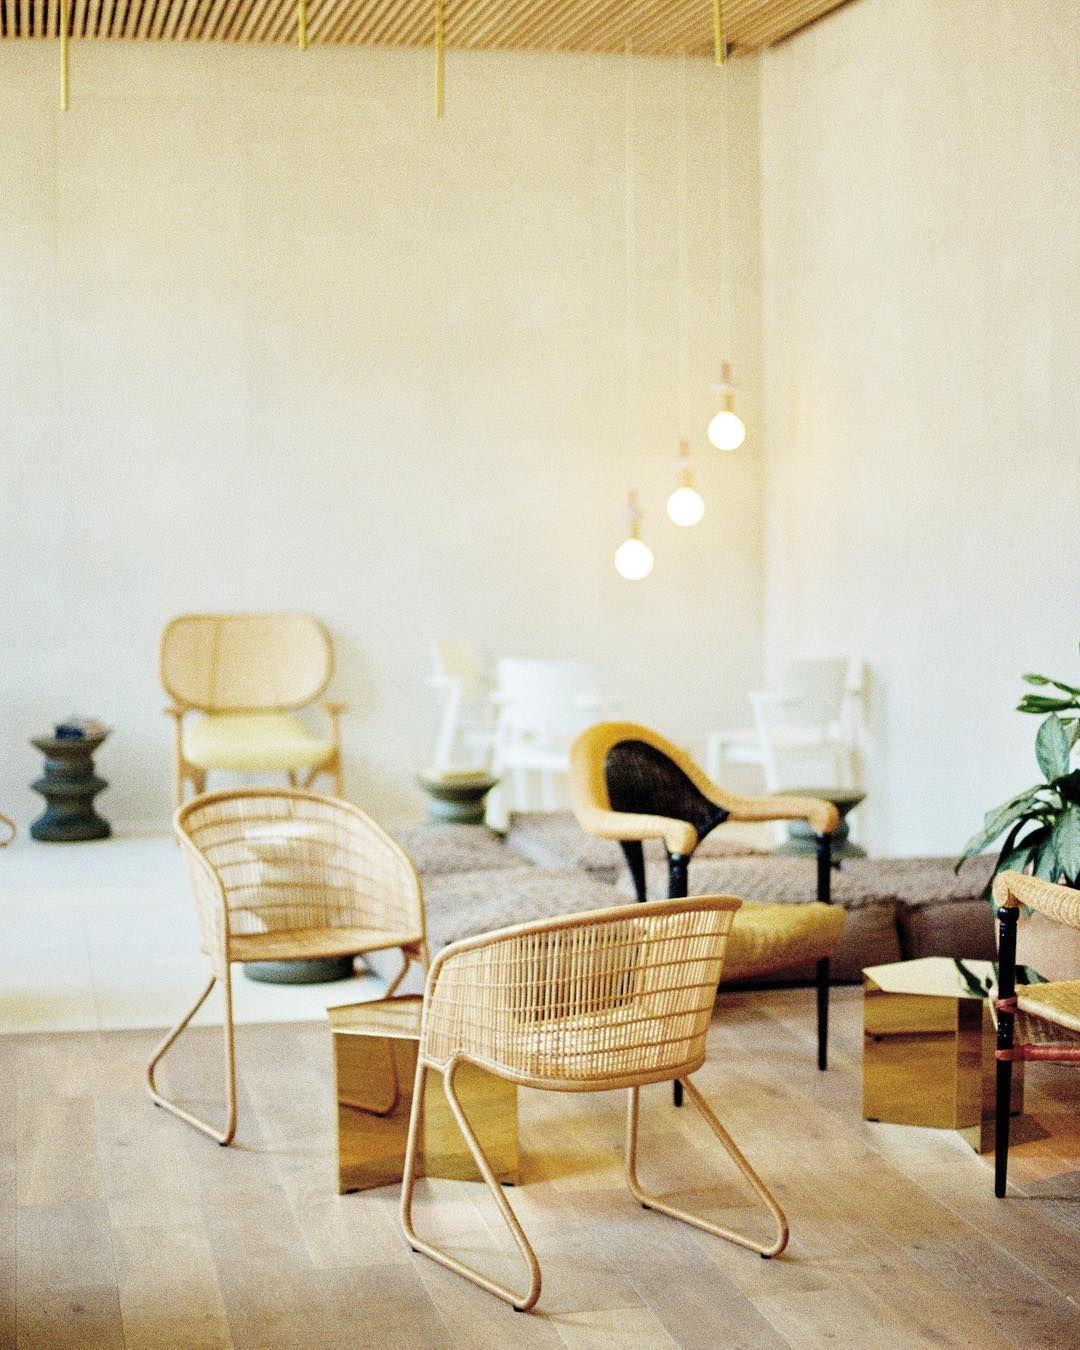 Our Favorite Scandi Design Spots Around The World Scandi Design Design Scandinavian Design